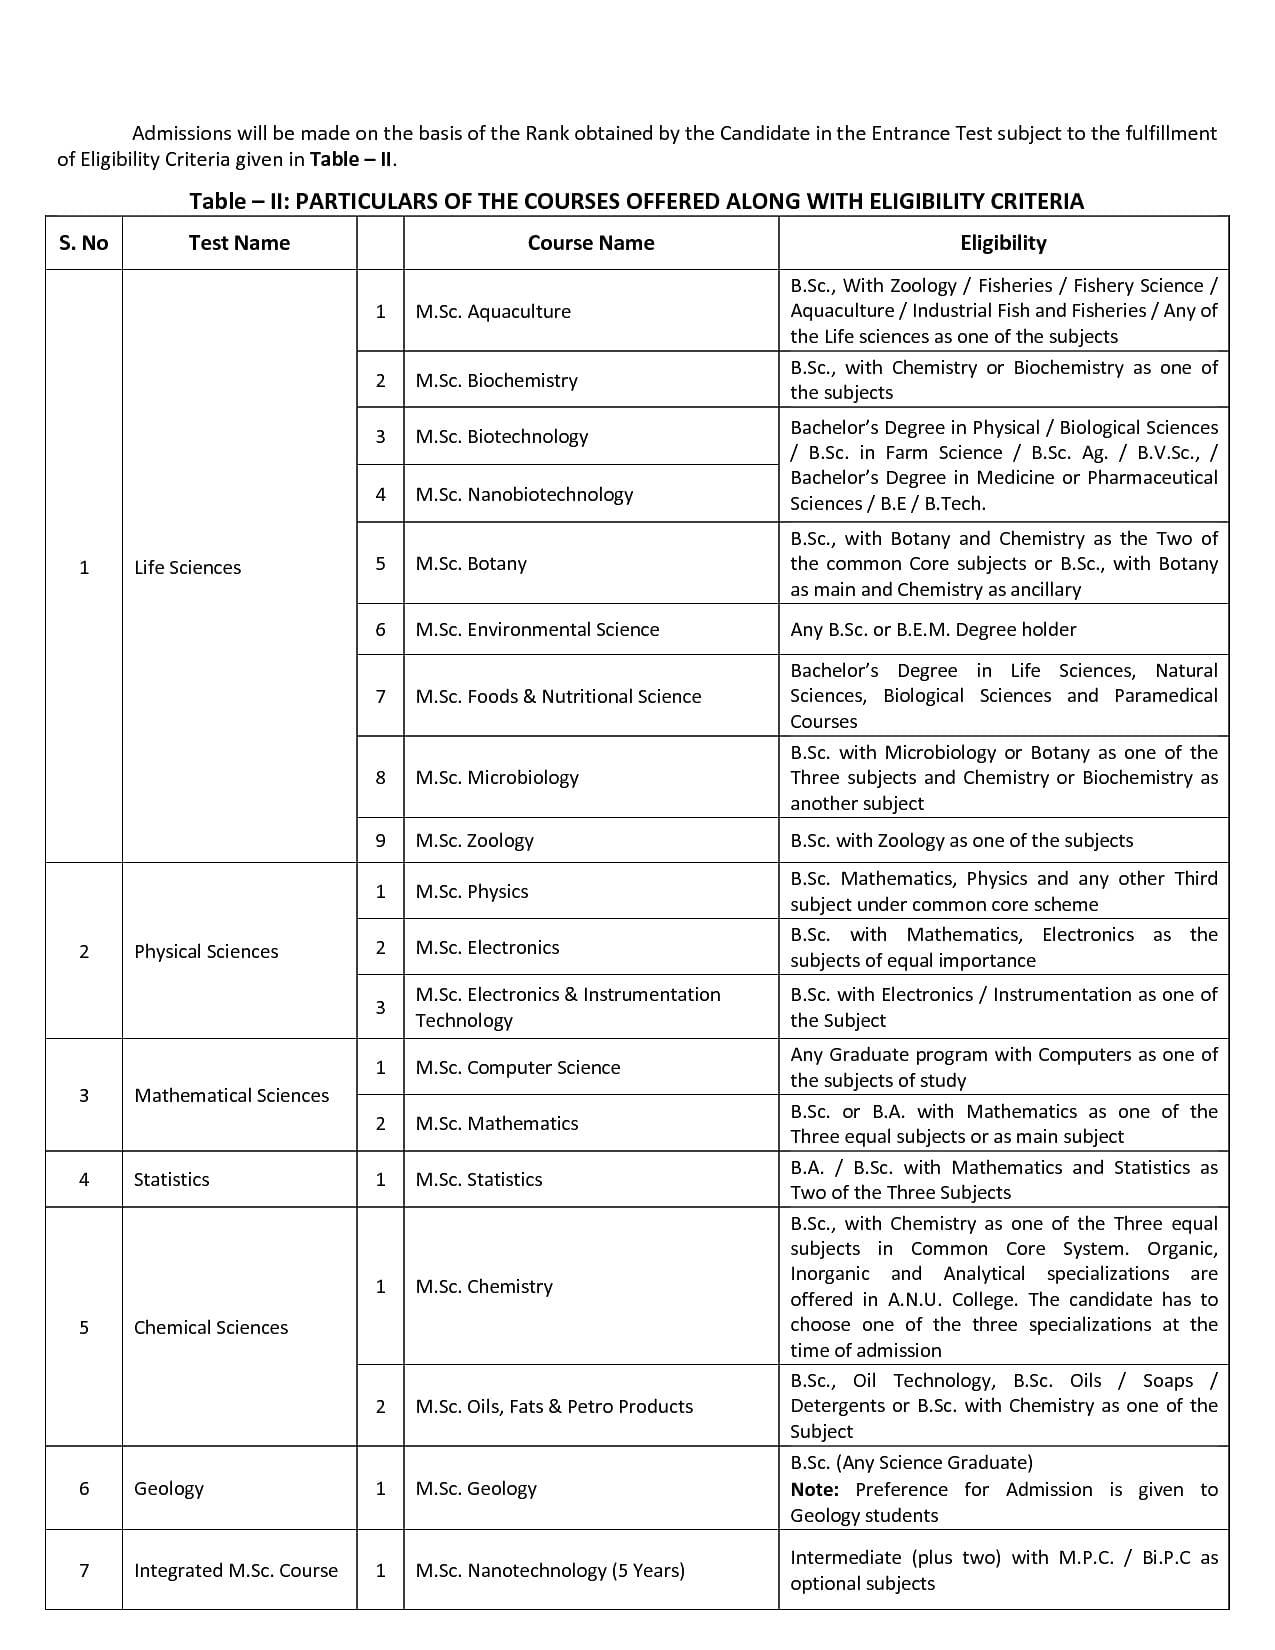 ANU - Acharya Nagarjuna University, Guntur - Admissions, Courses